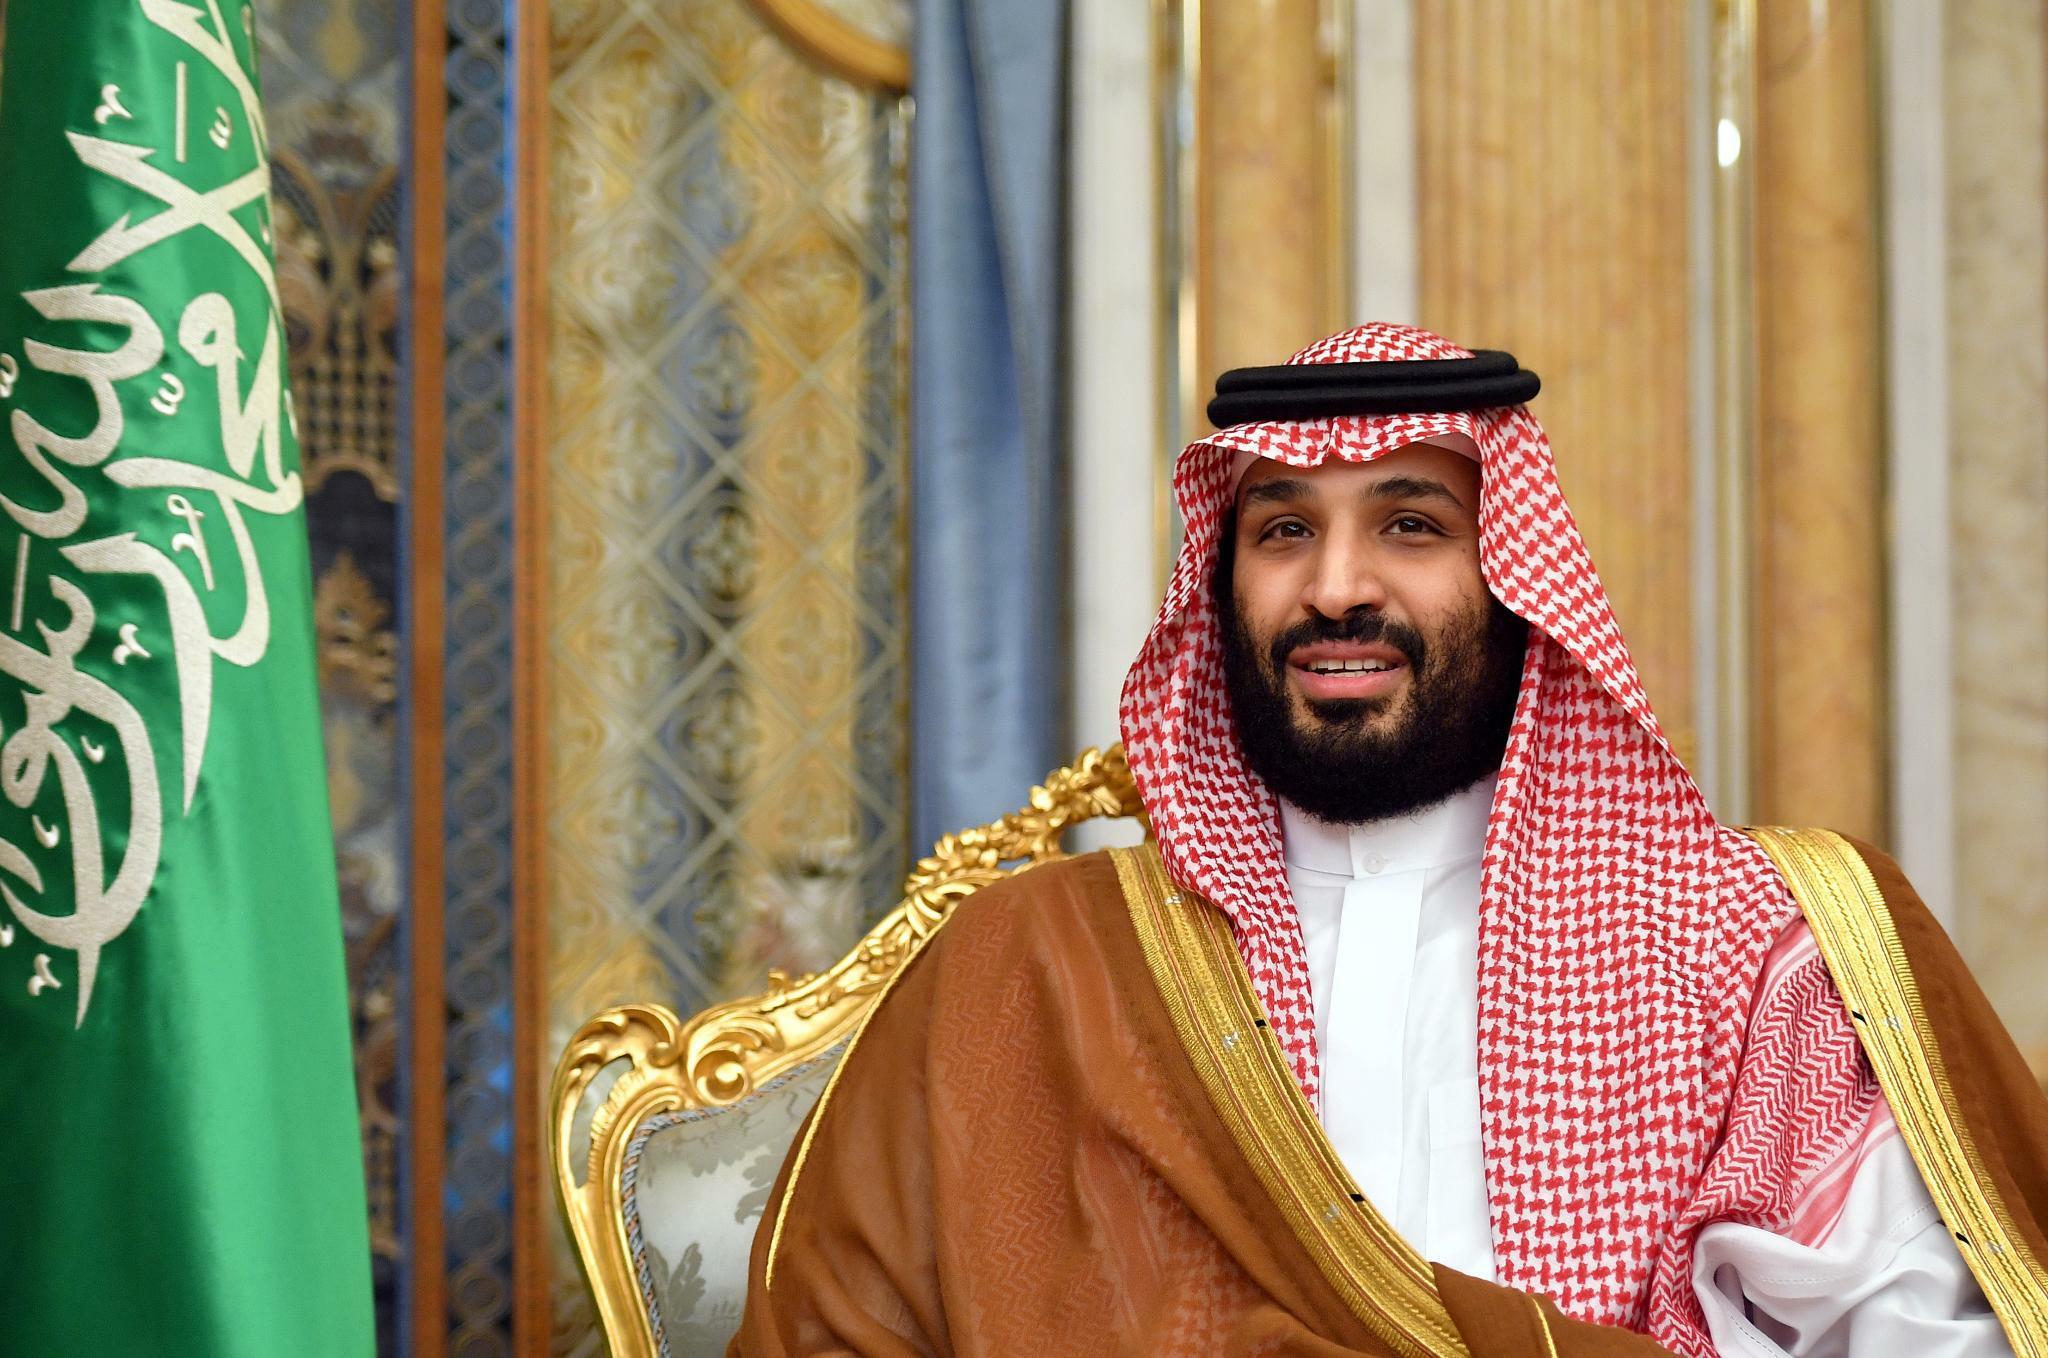 Ölkonzern: Warum Saudi Aramco den Börsengang erneut abgeblasen hat